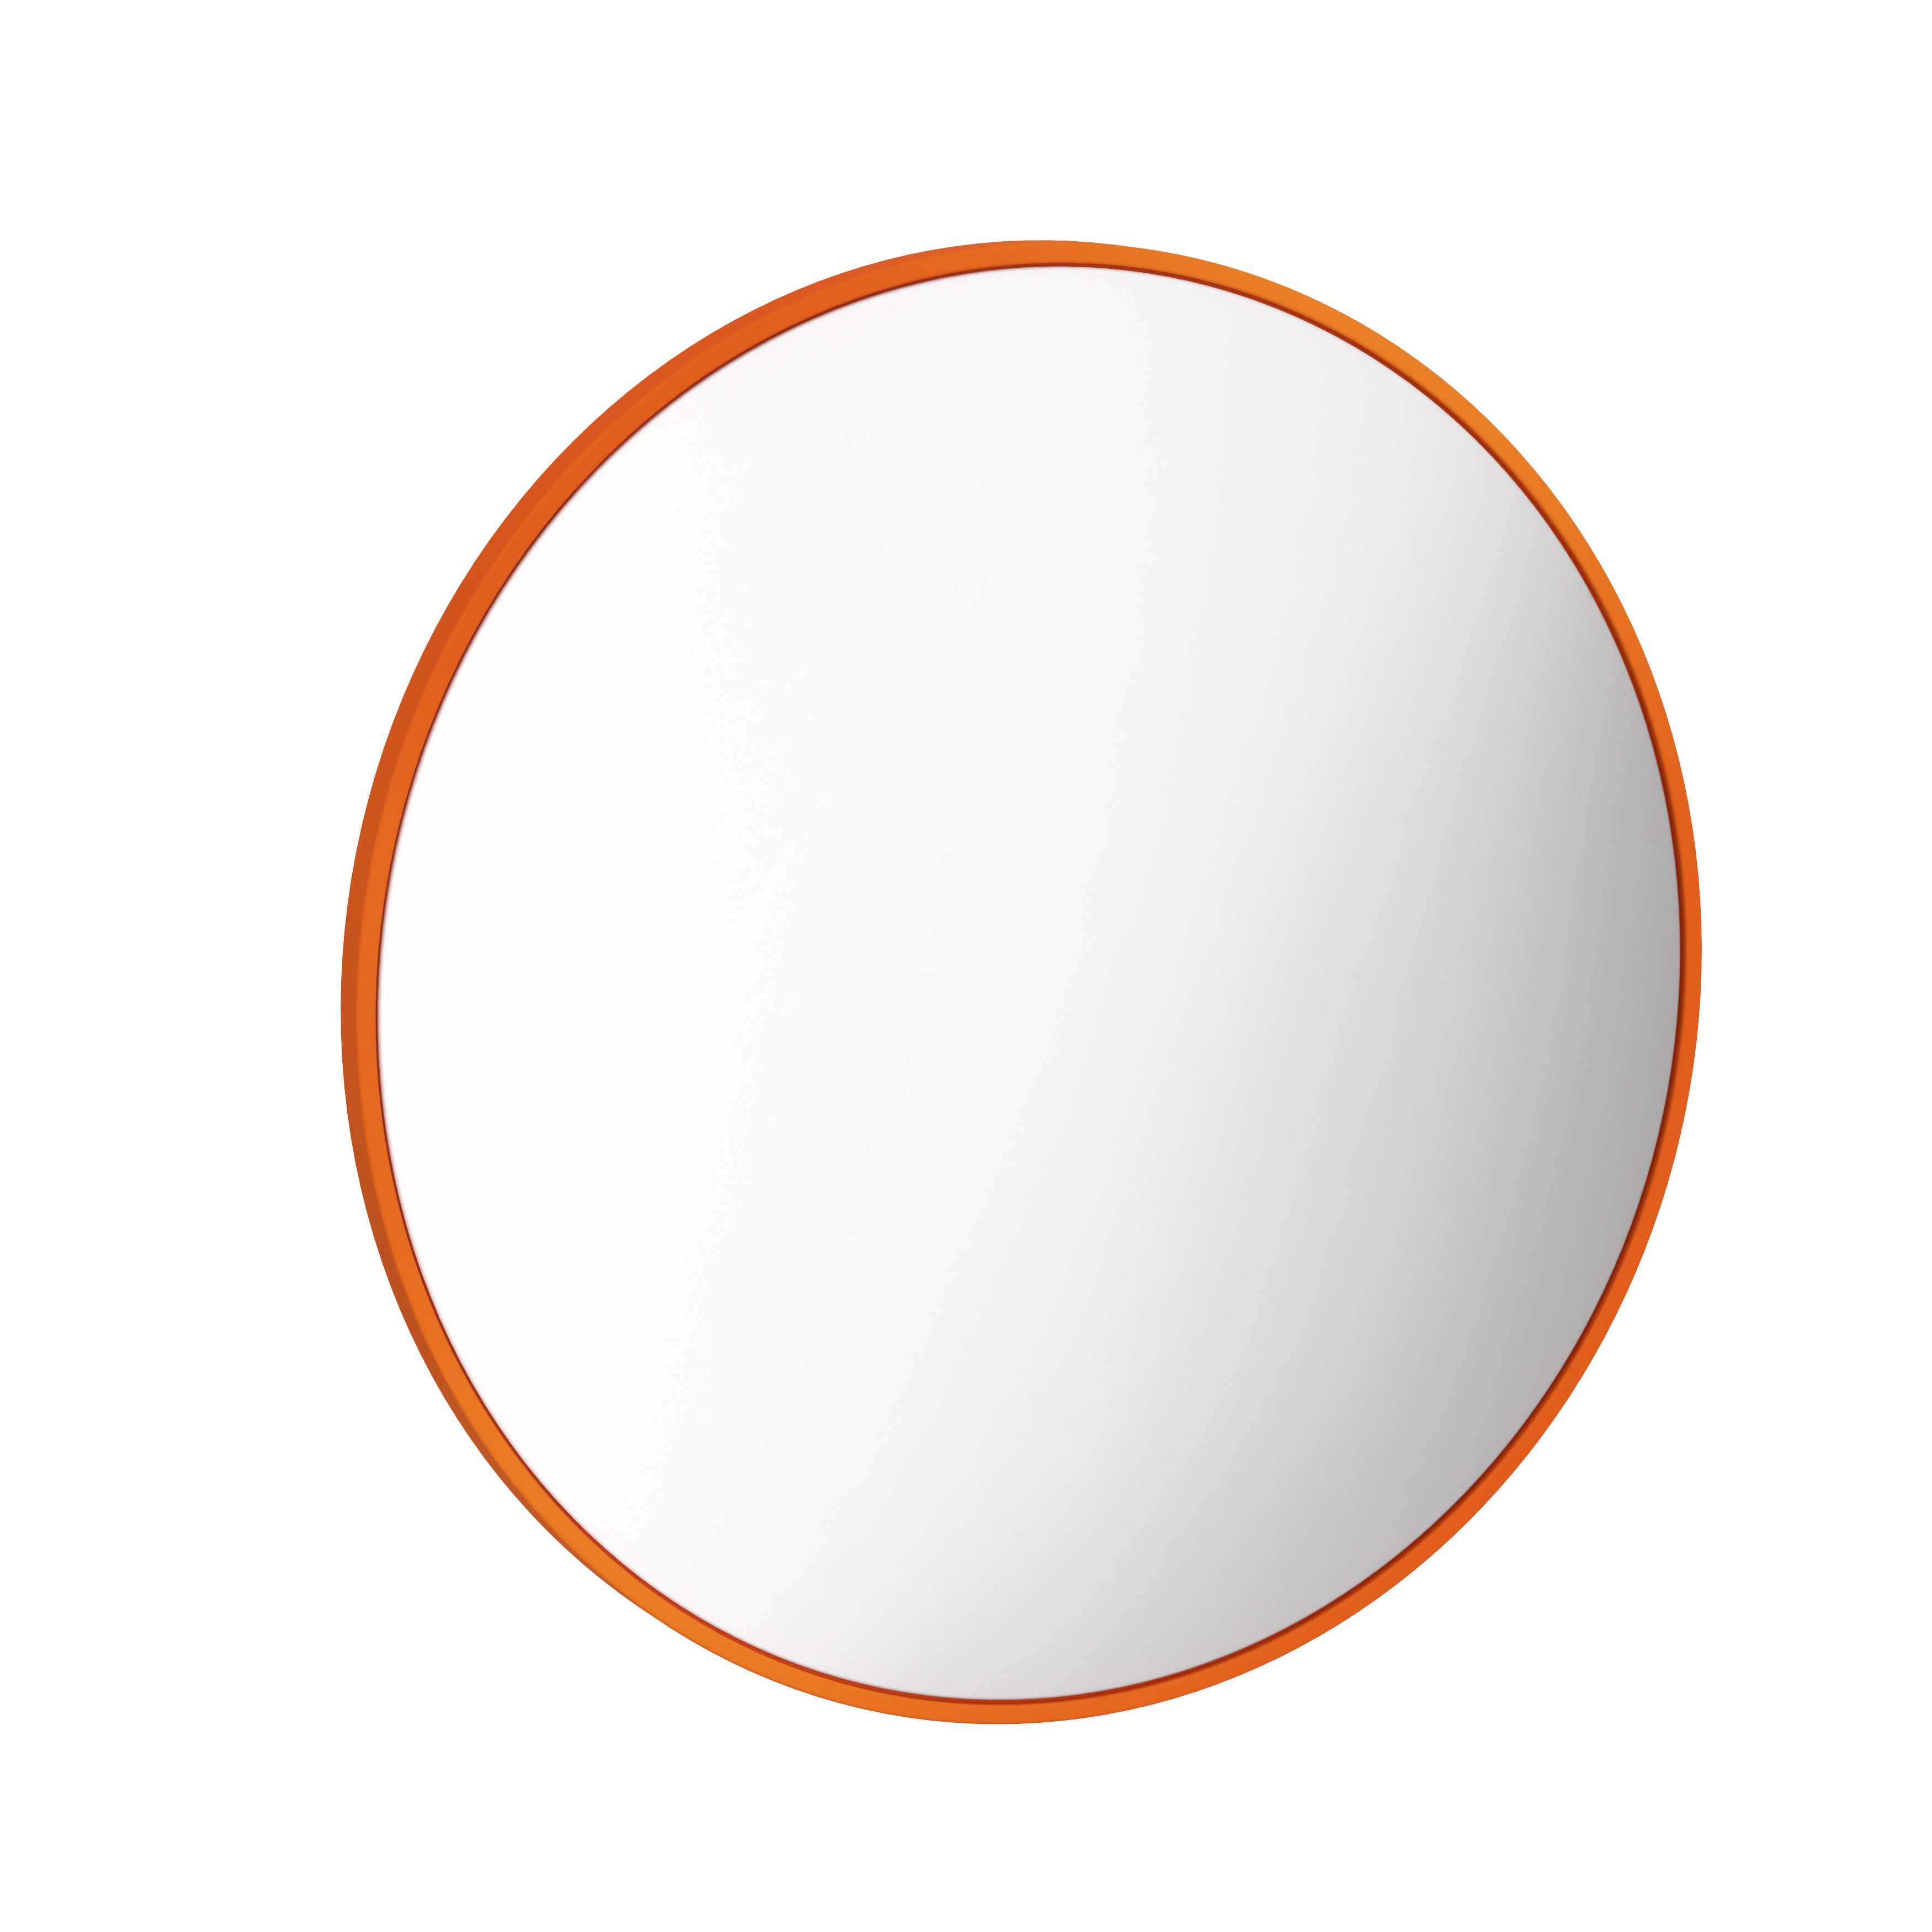 Sento Kids miroir ronde, 60 cm, orange